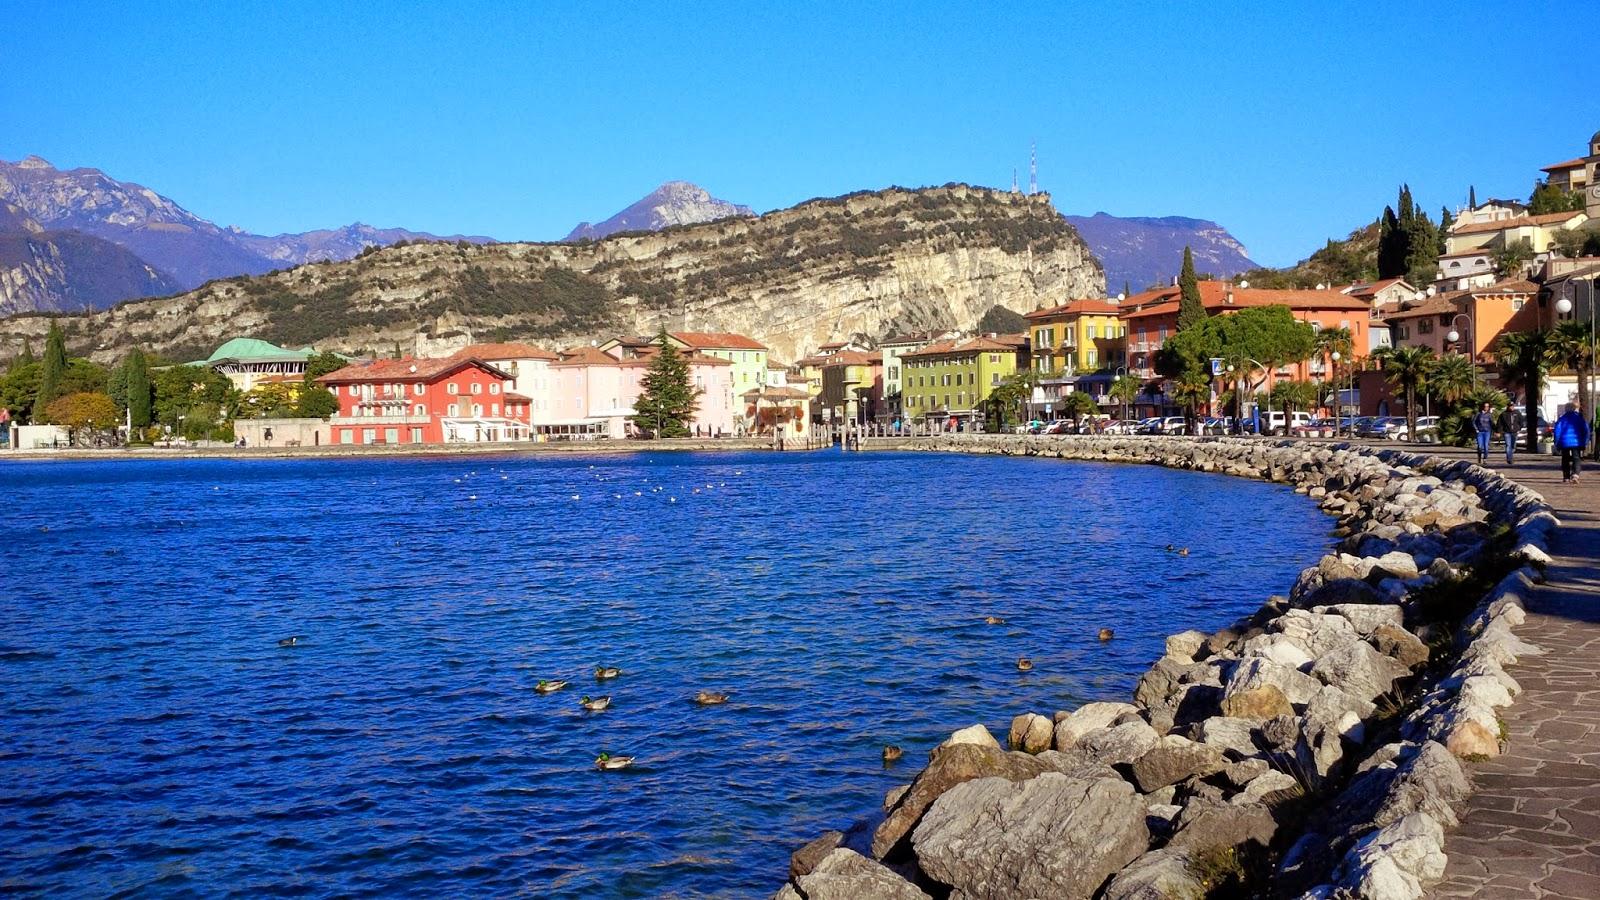 Torbole on Lake Garda